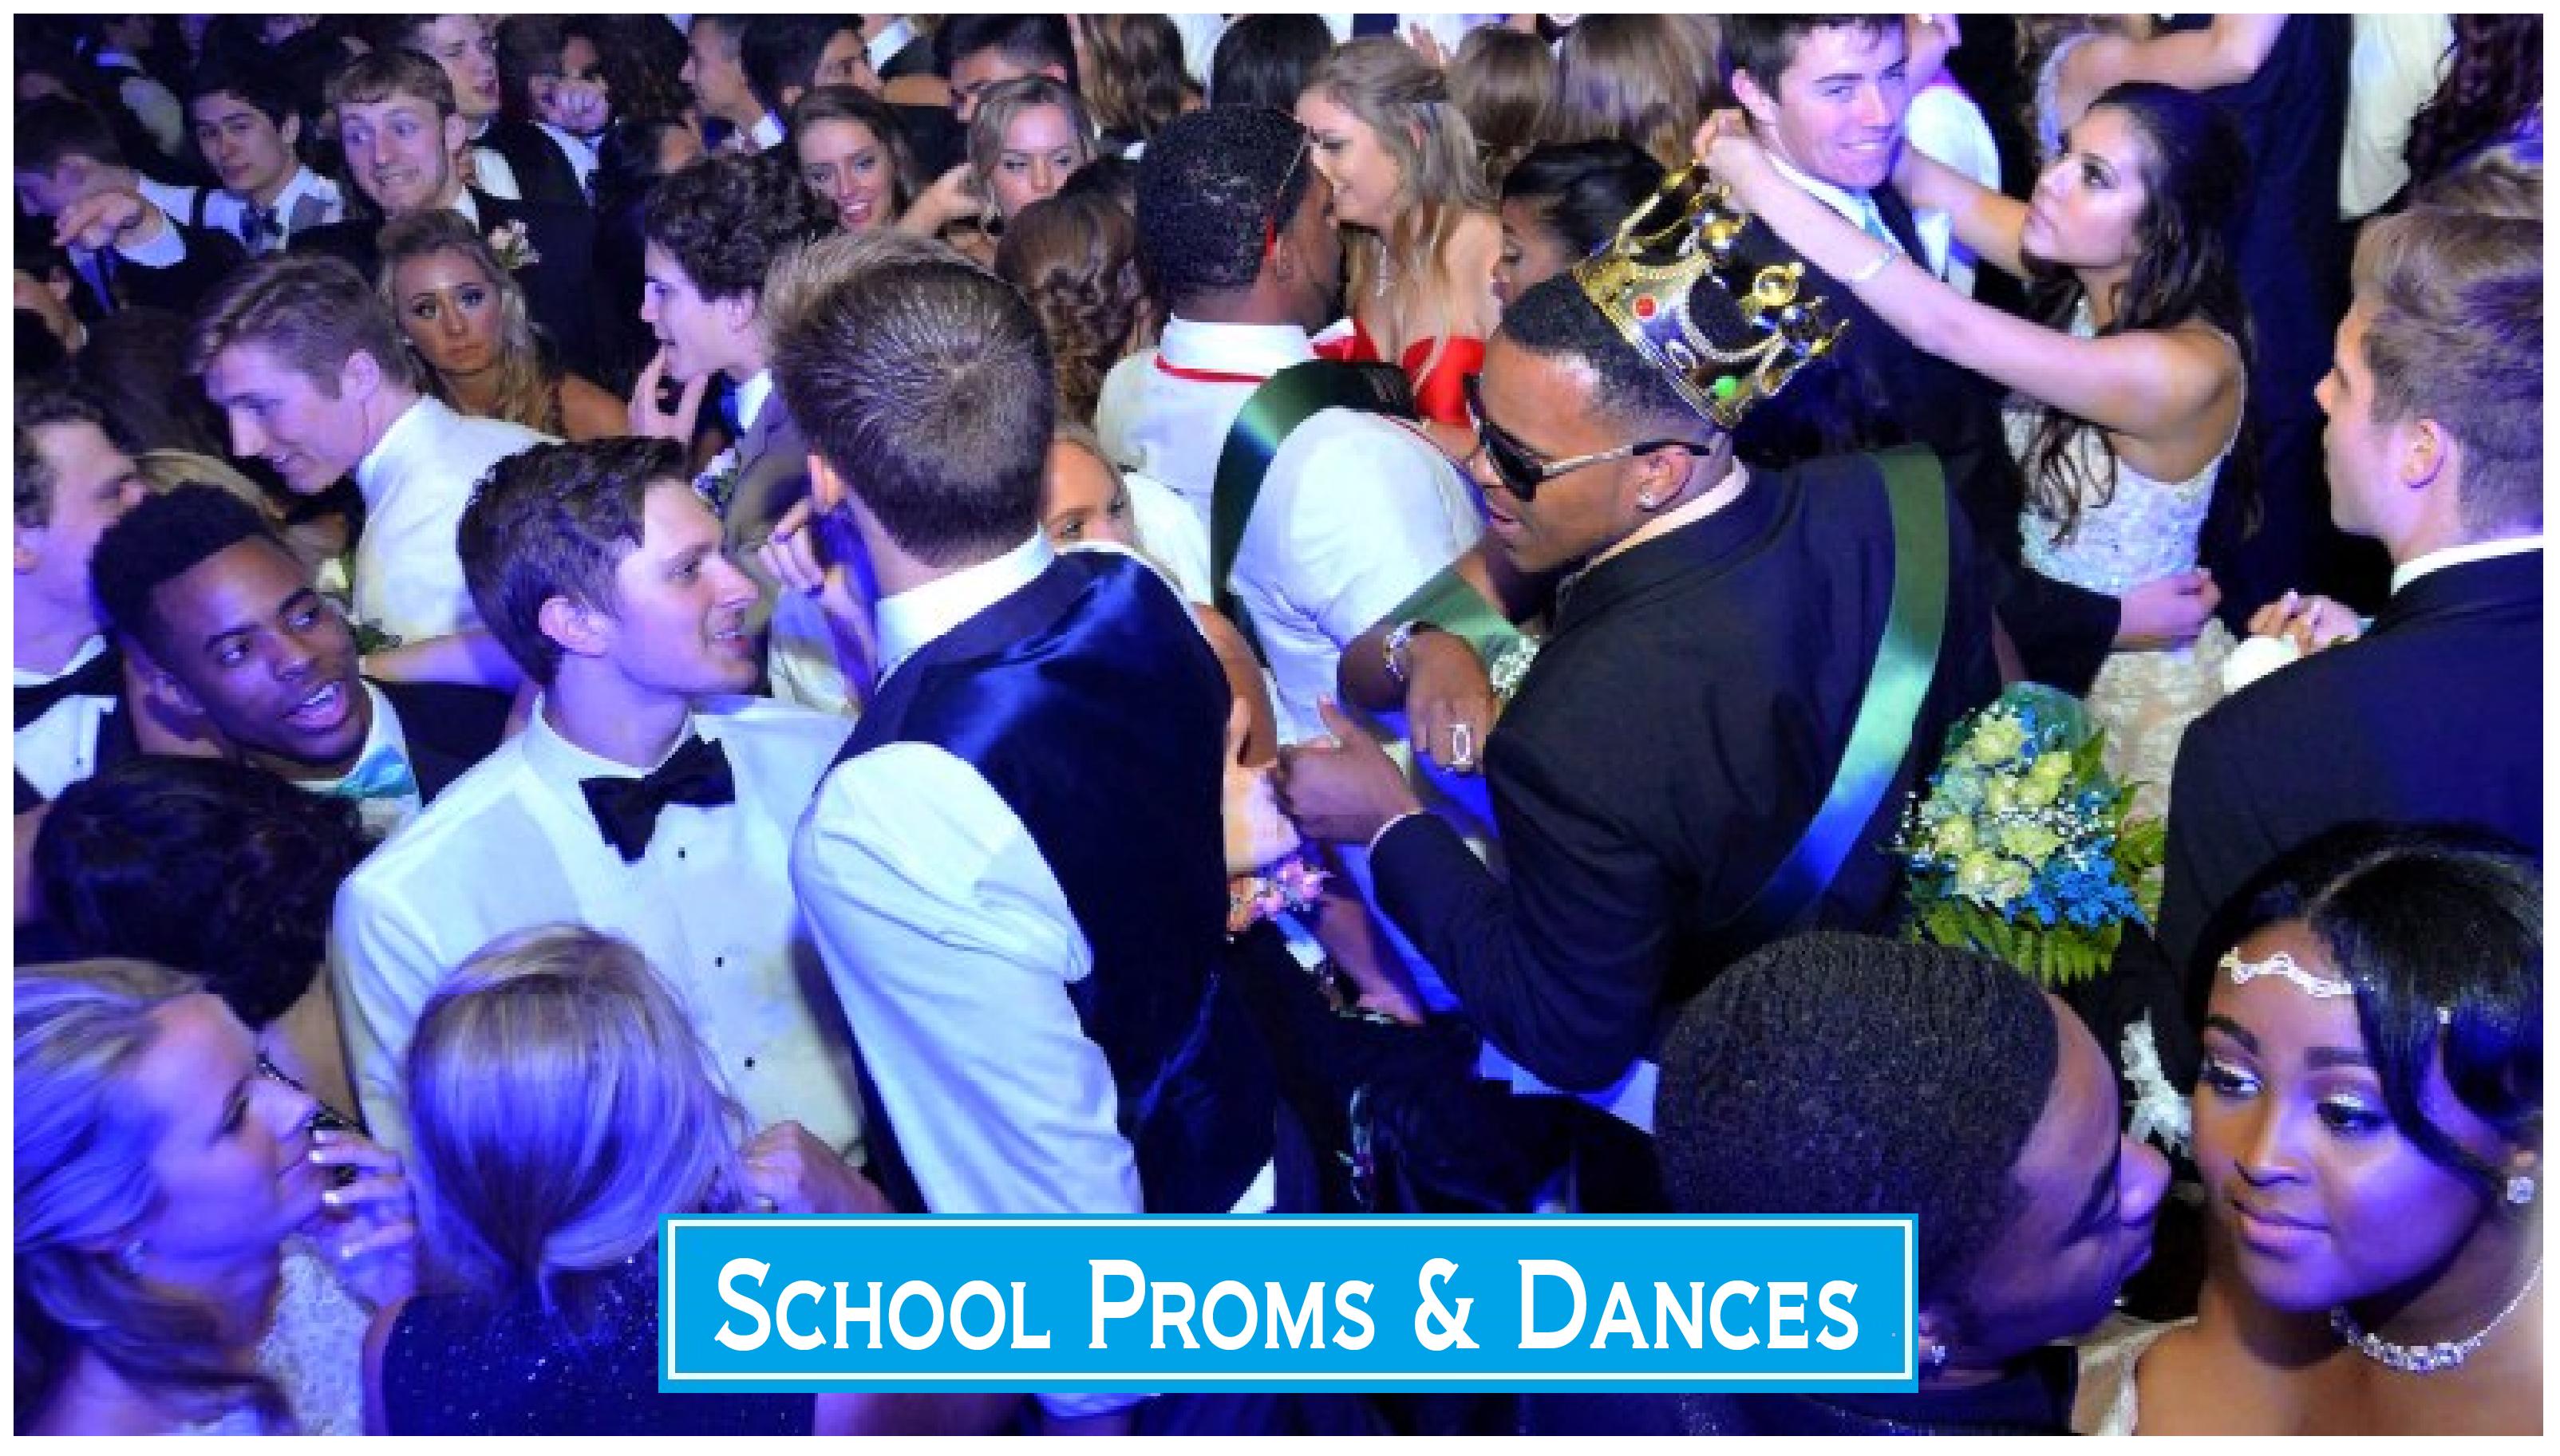 Houston Prom DJ, School Dance in Houston, Houston Homecoming Dance DJ in Houston, High School, Elementary School, Middle School, Junior High School, Fundraiser, Band, Choir, Orchestra, ROTC Banquet